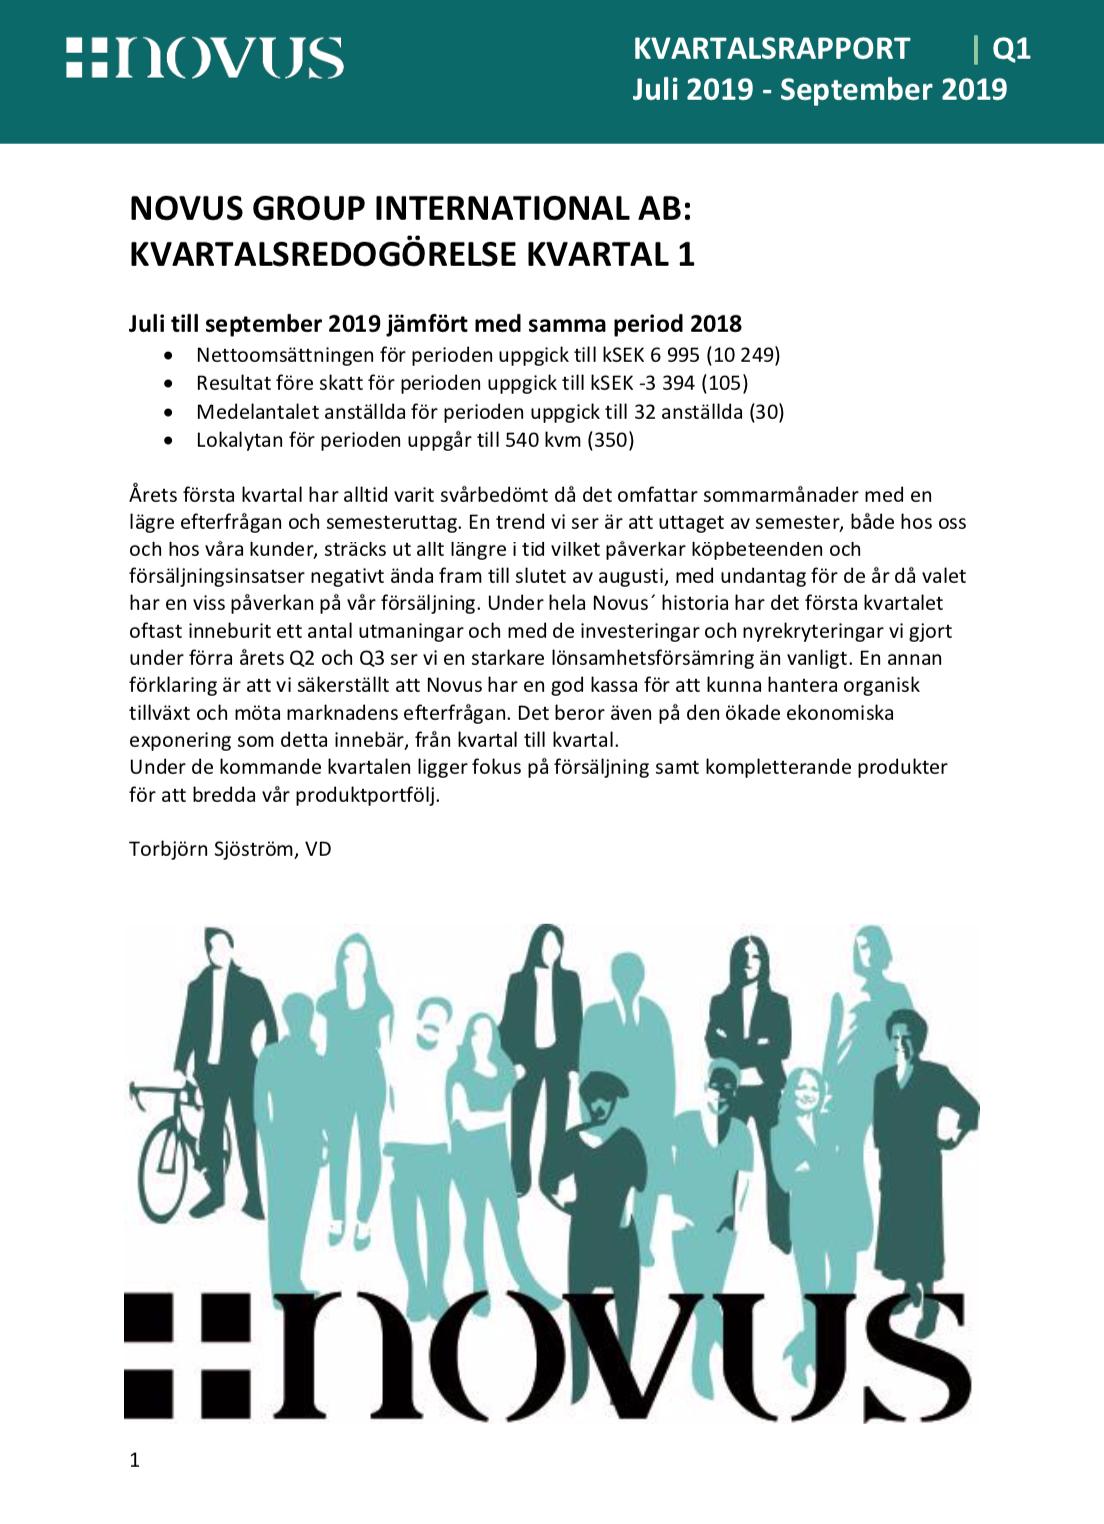 Novus Group International AB: KVARTALSRAPPORT   Q3   januari 2020-mars 2020